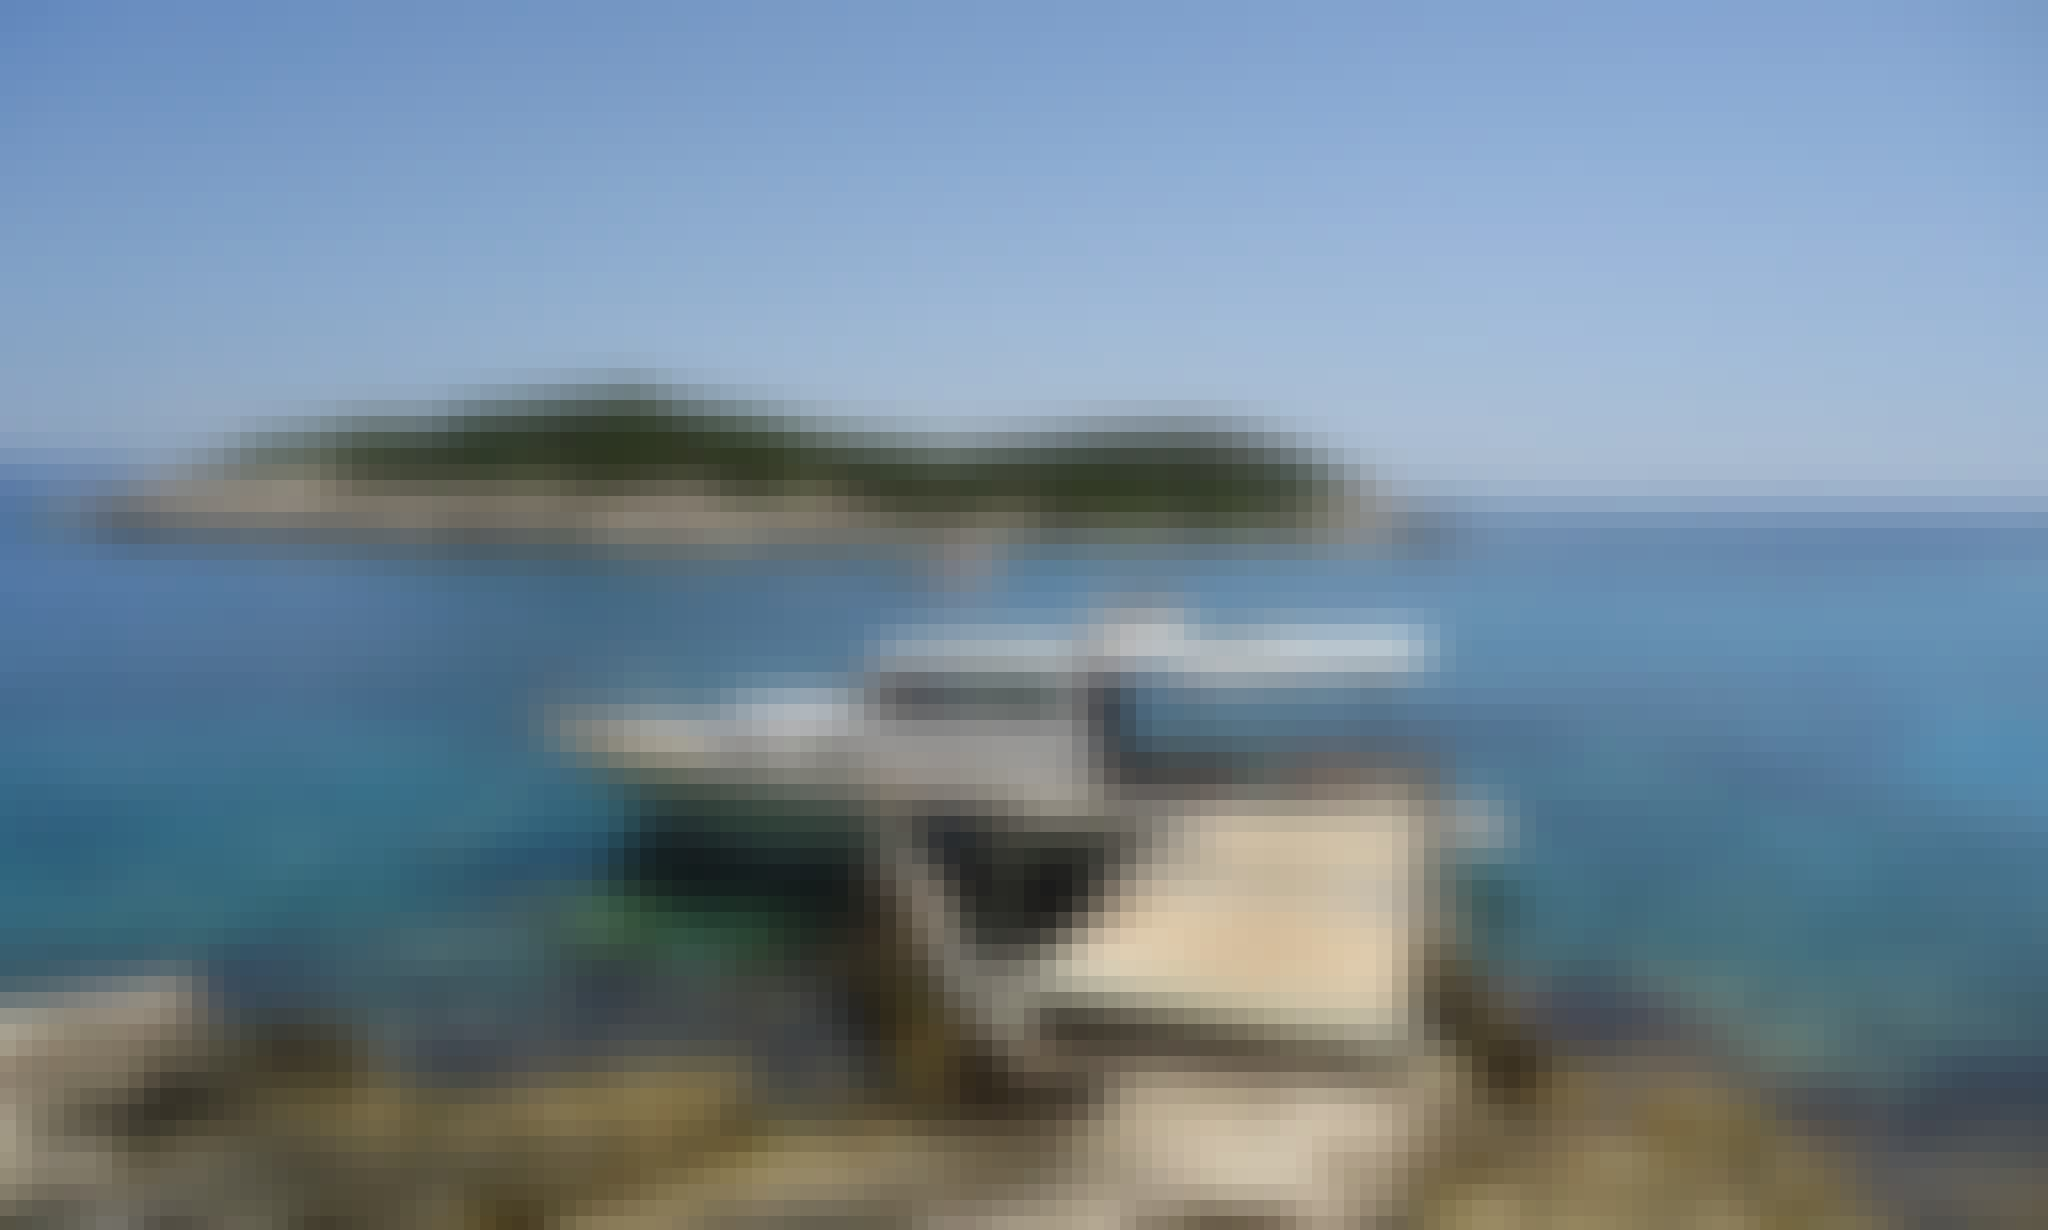 Half Day Excursion to Saplun Beach in Lastovo Archipelago - Lunch Included!